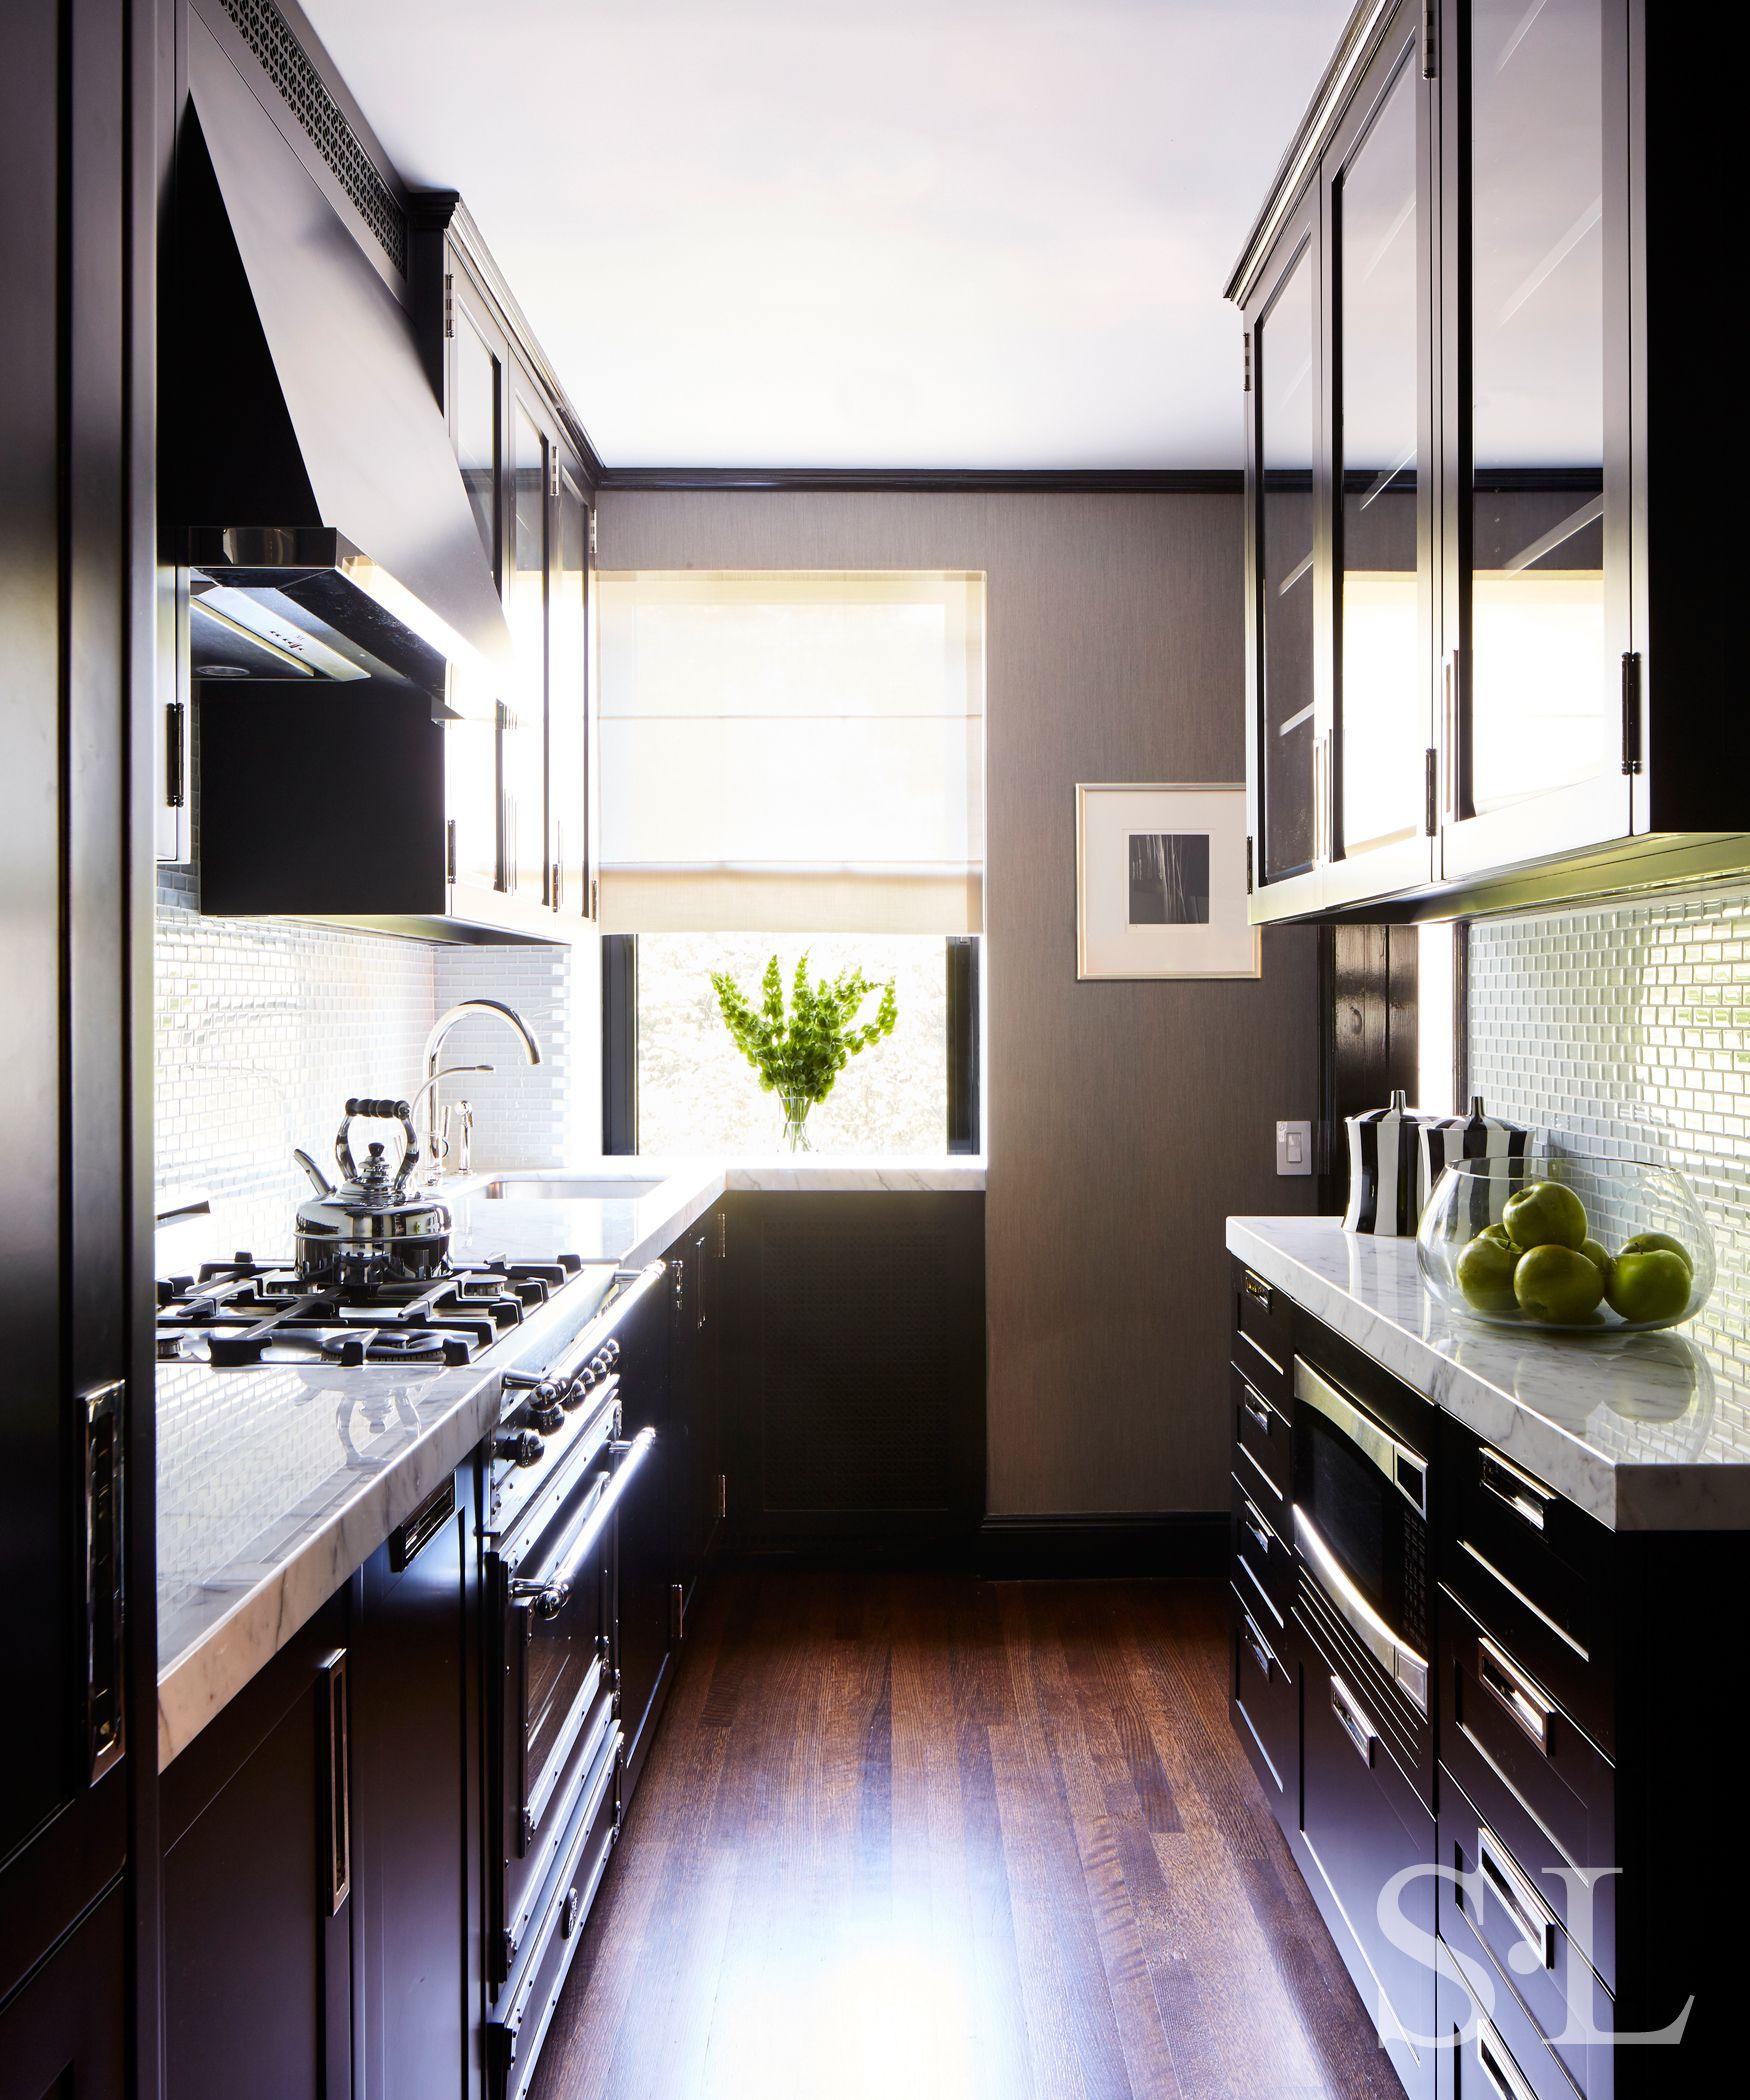 Fitted Kitchen Interior Designs Ideas Kitchen Cabinet: Pin On Decor